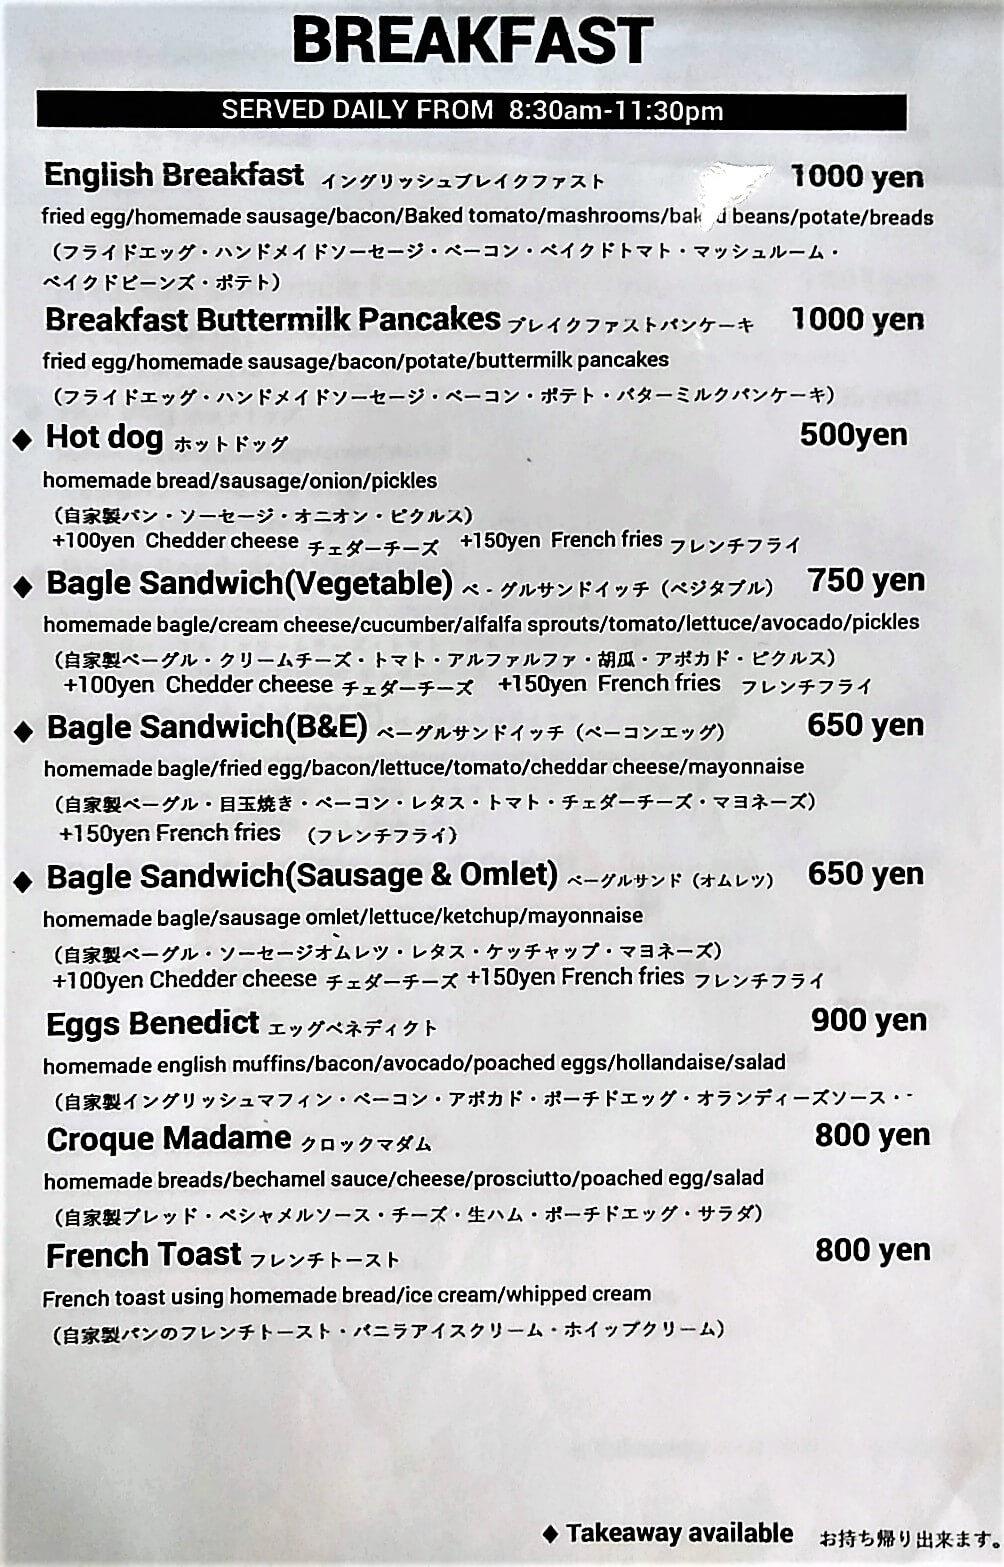 cafe SOLの新規朝ごはんbreakfastメニュー